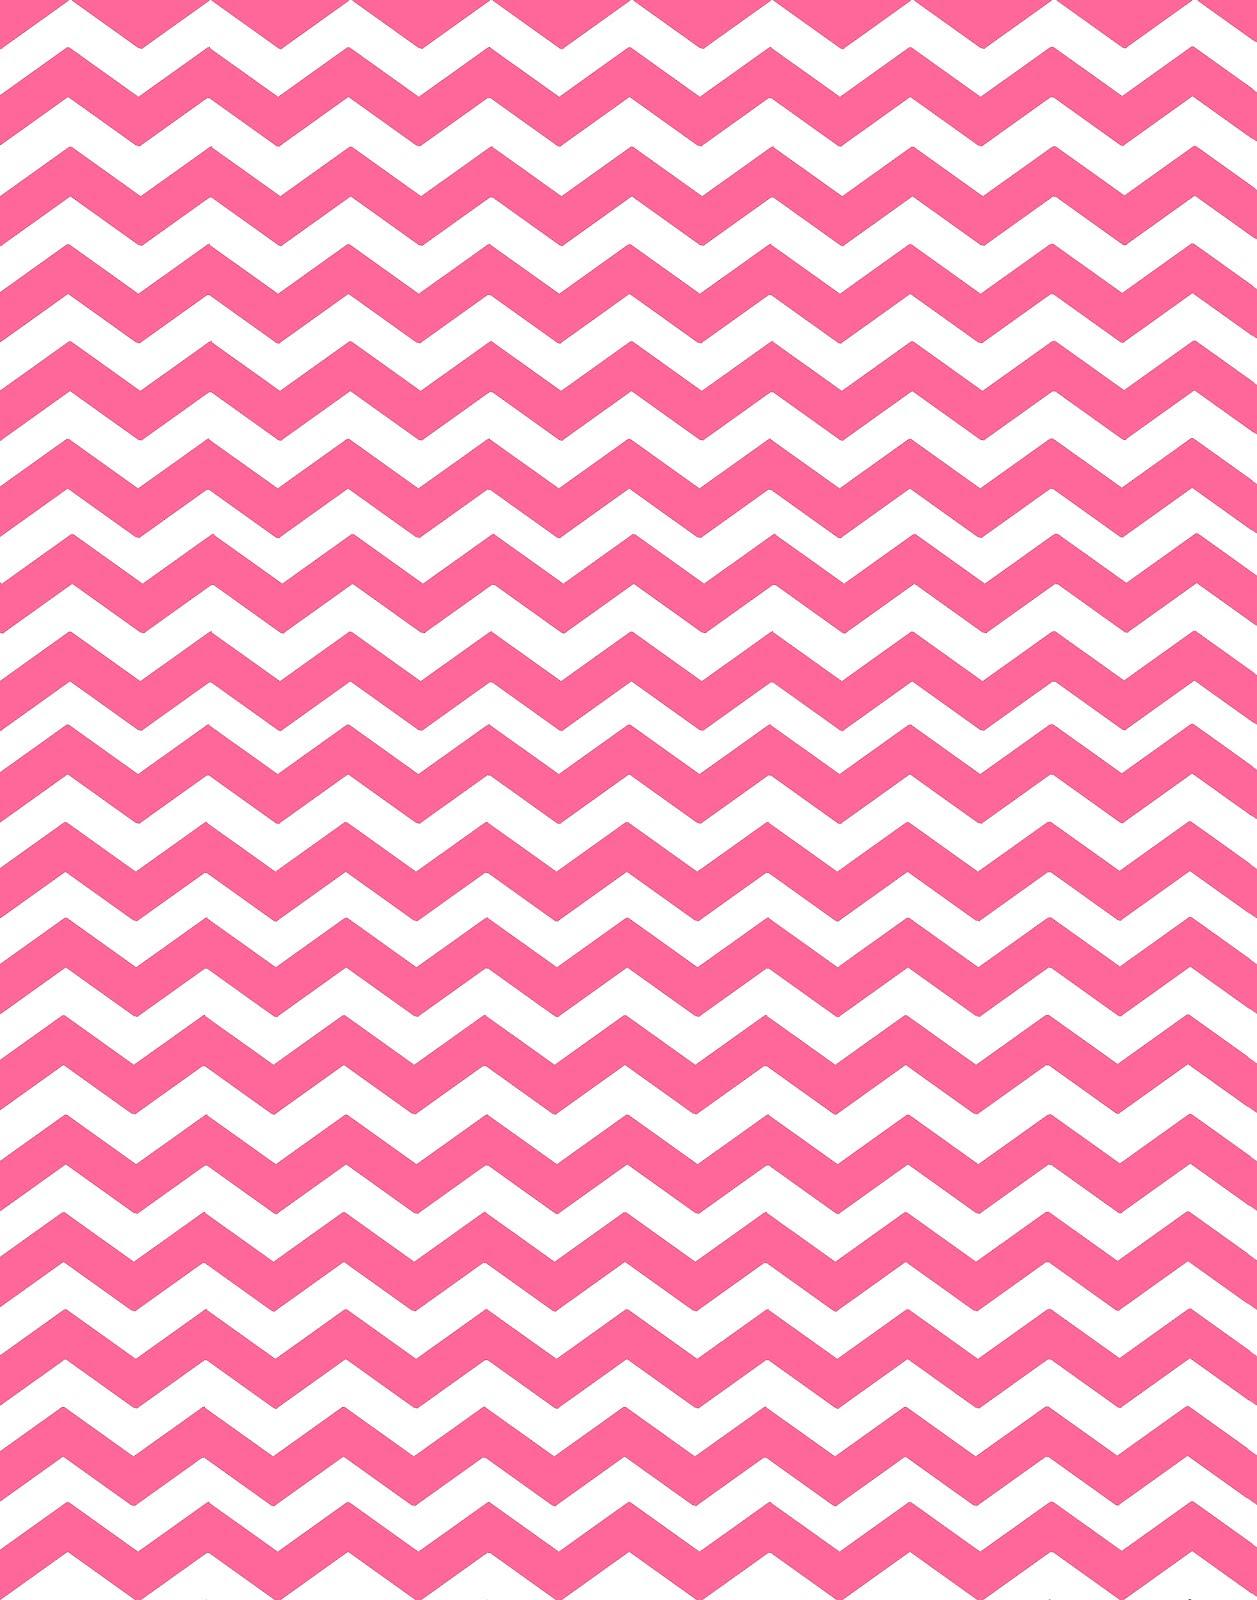 Pink And White Chevron Wallpaper Wallpapersafari